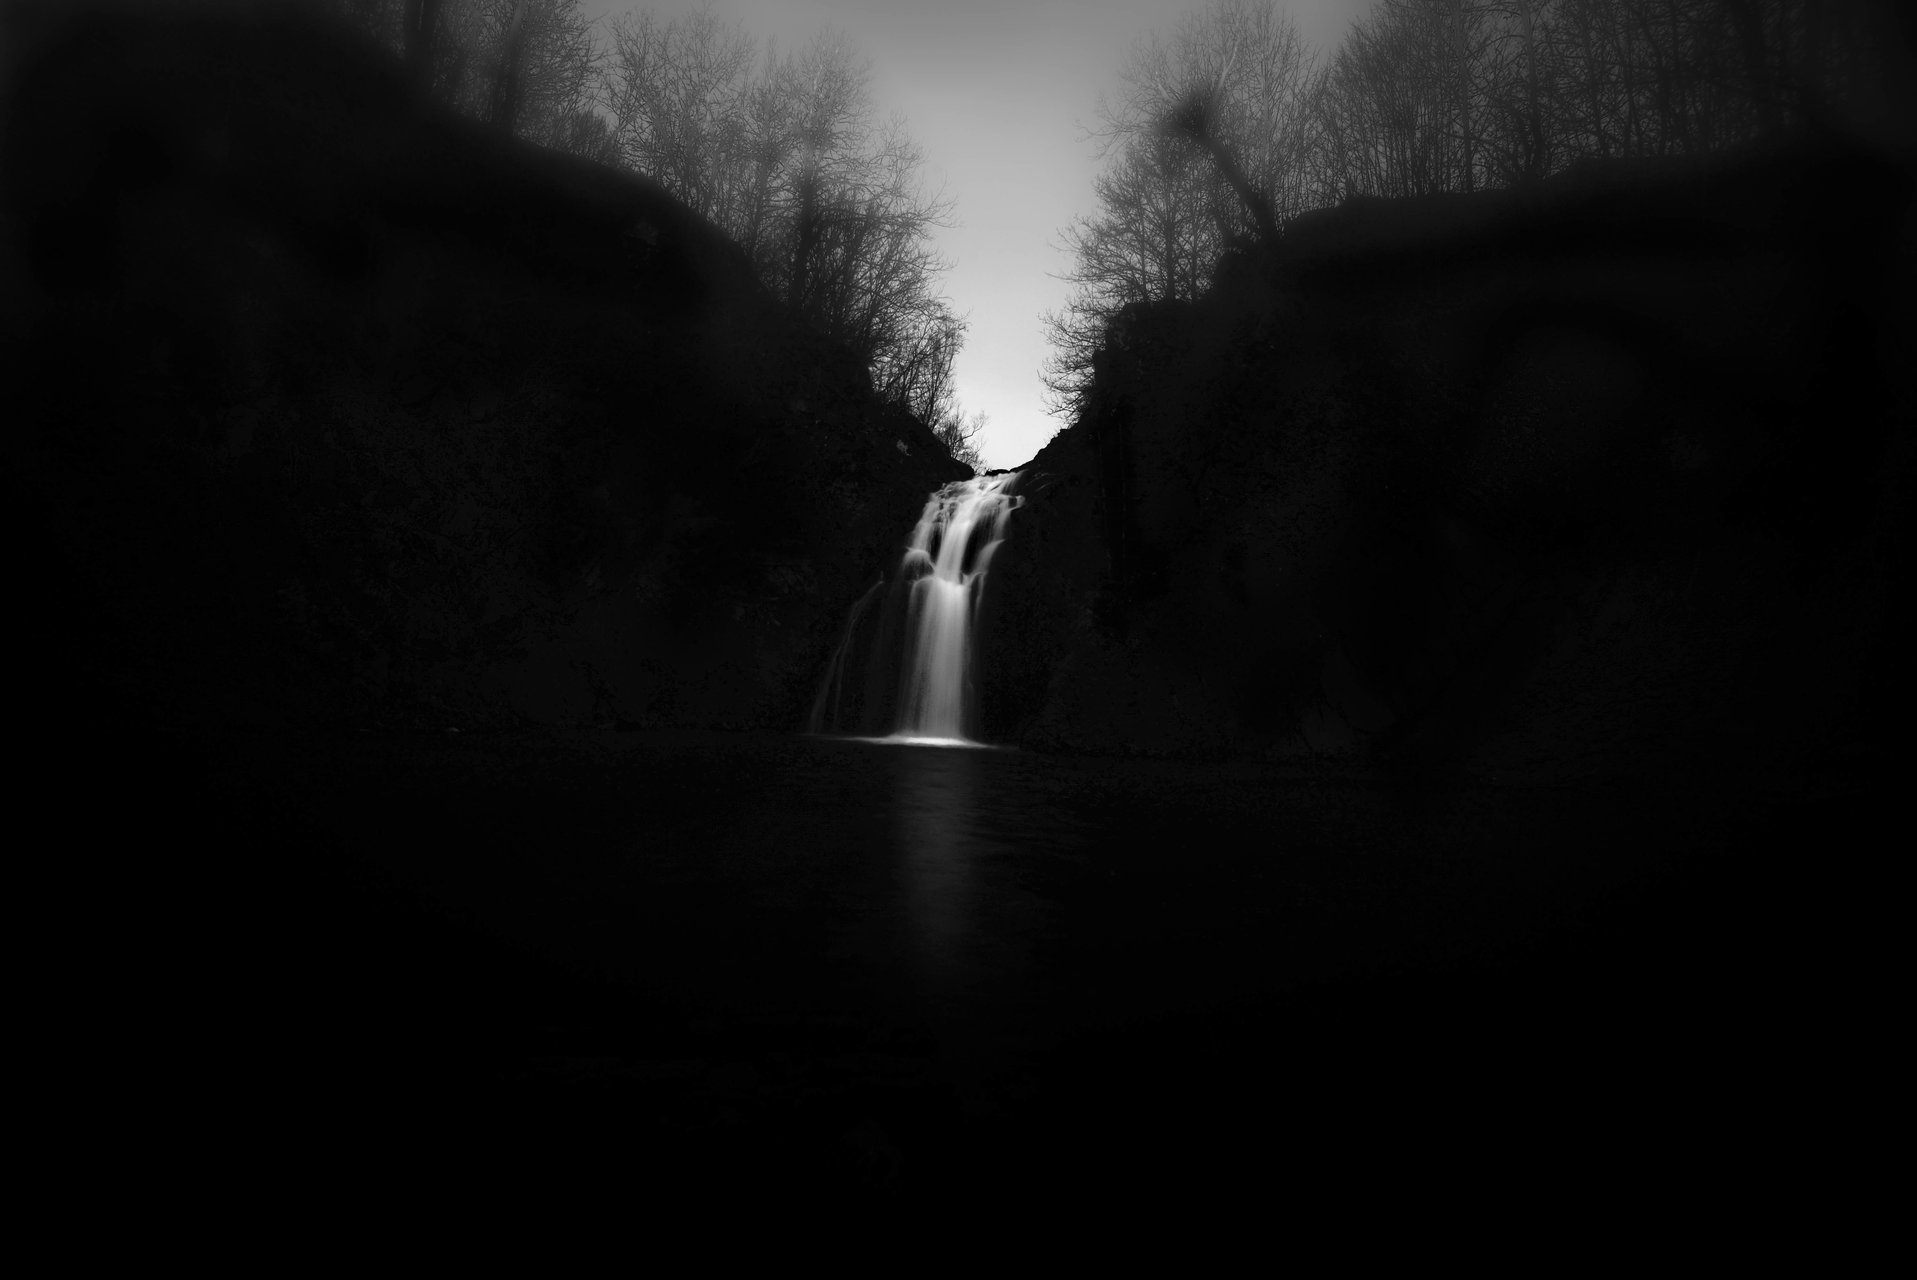 Photo in Experiment | Author Stanislav Lalev - Staffo | PHOTO FORUM